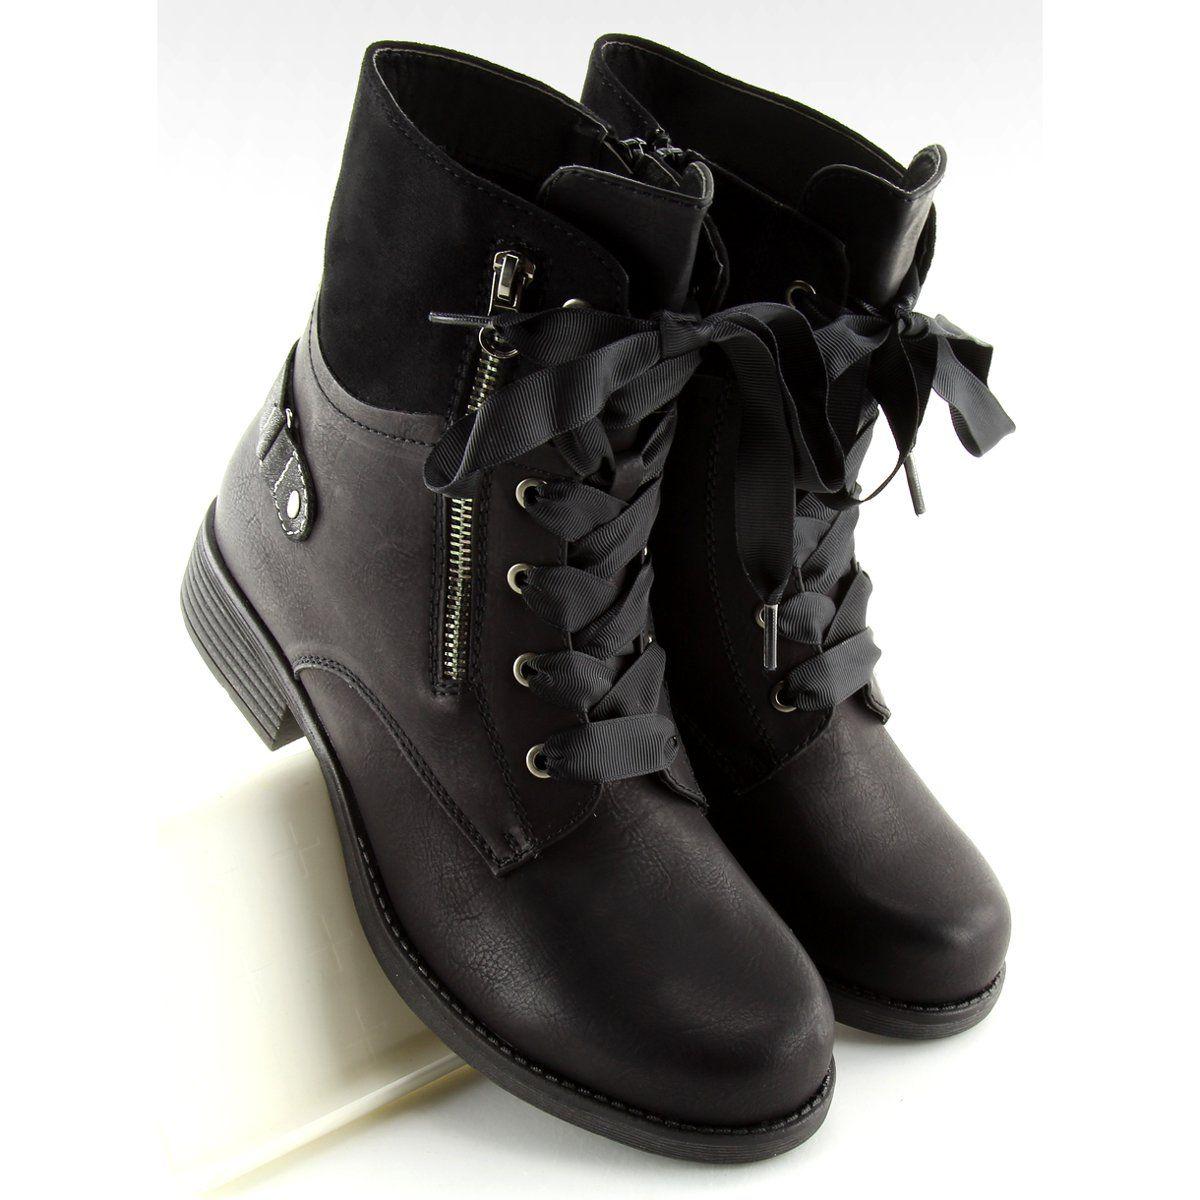 Botki Sznurowane Workery Czarne 17103 2 Black Lace Boots Bootie Boots Womens Ankle Boots